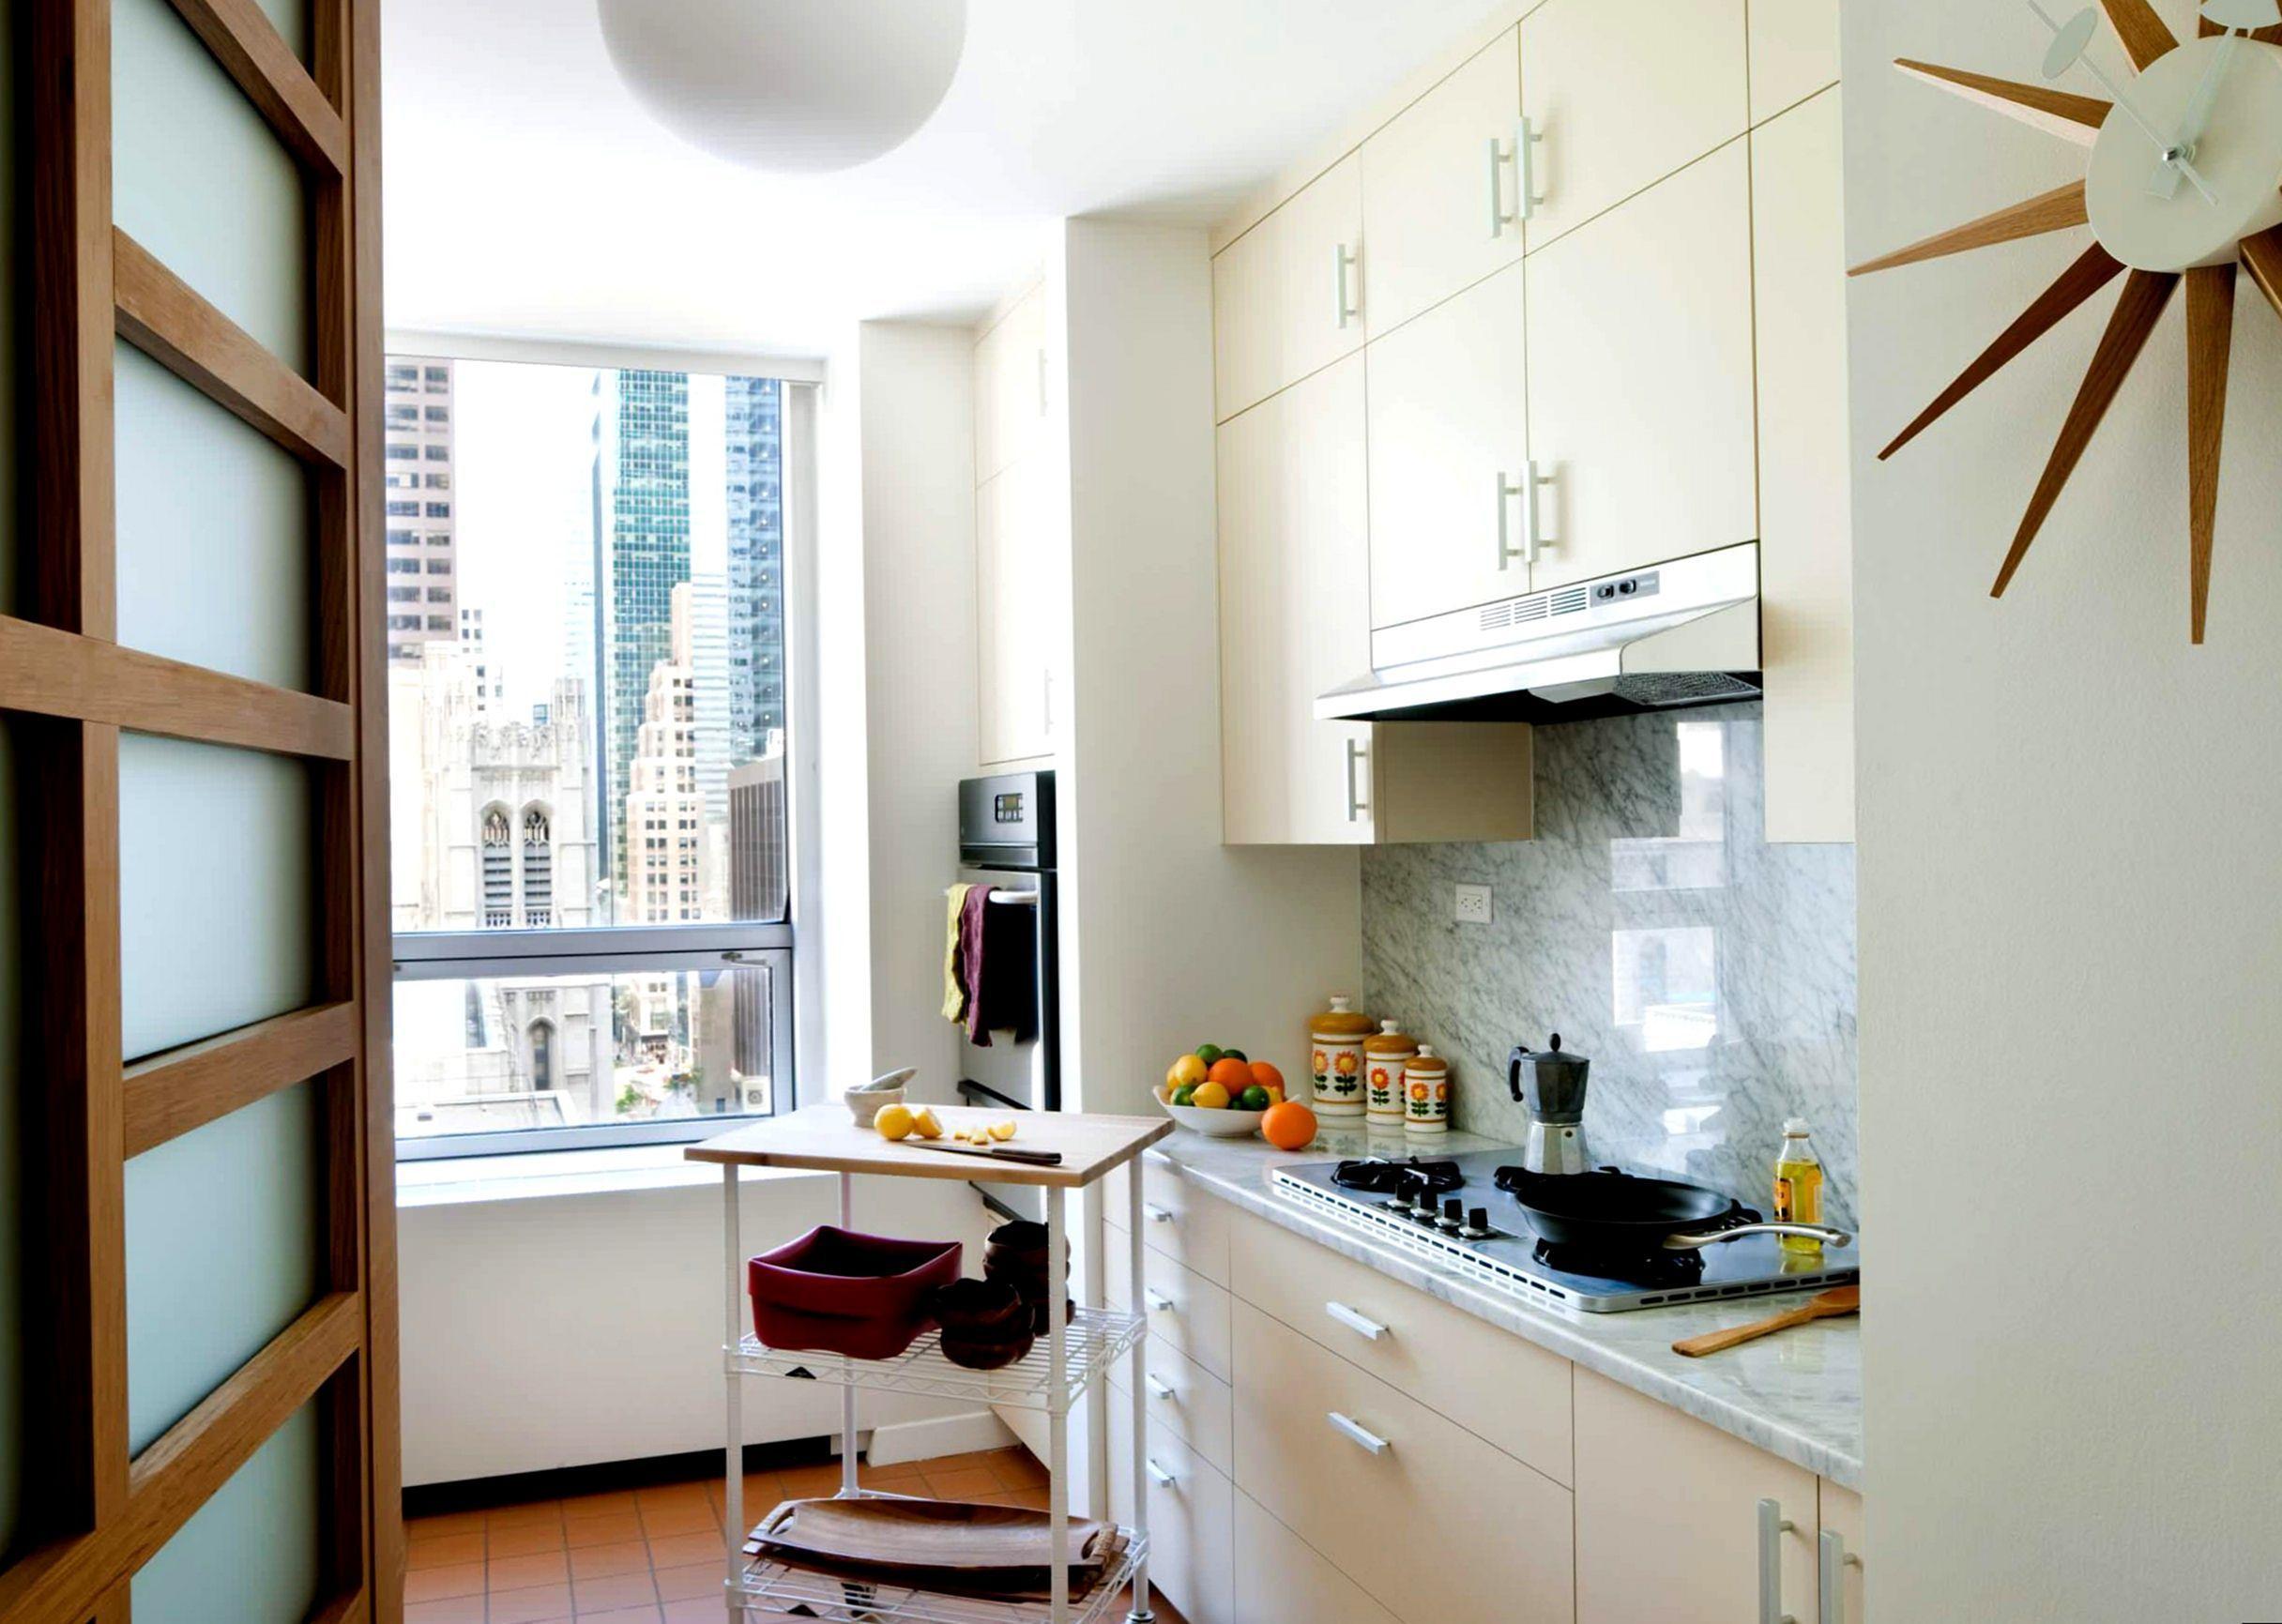 12 Comfortable Small Kitchen Designs